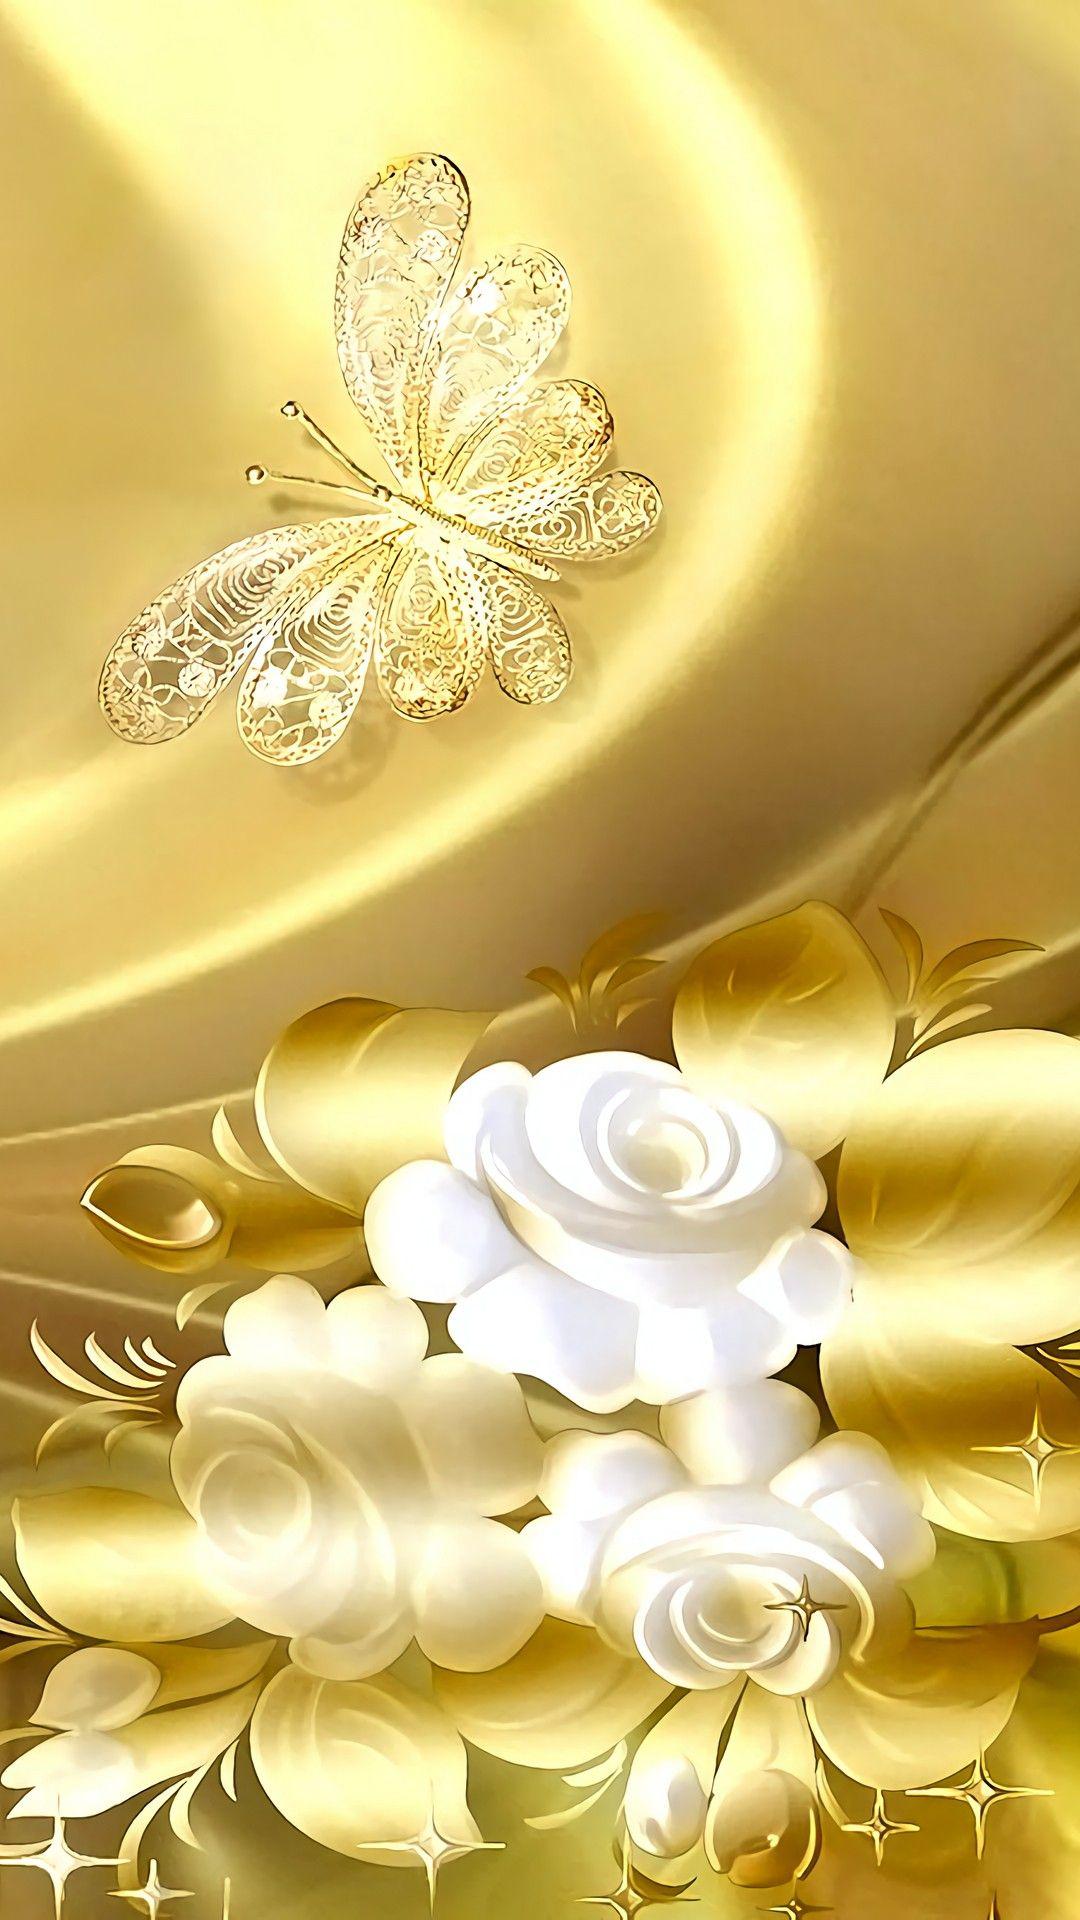 Golden with Butterfly wallpaper | Butterfly wallpaper ...